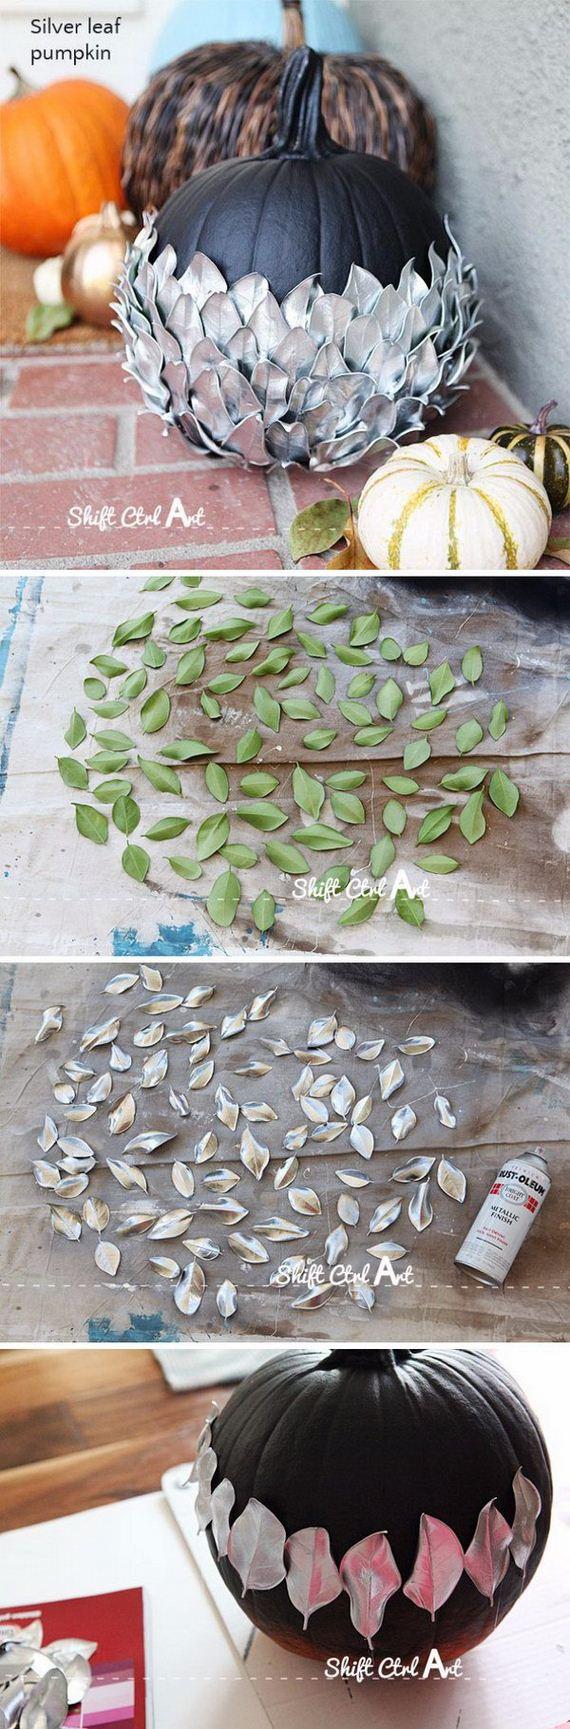 14-no-carve-pumpkin-decorating-ideas